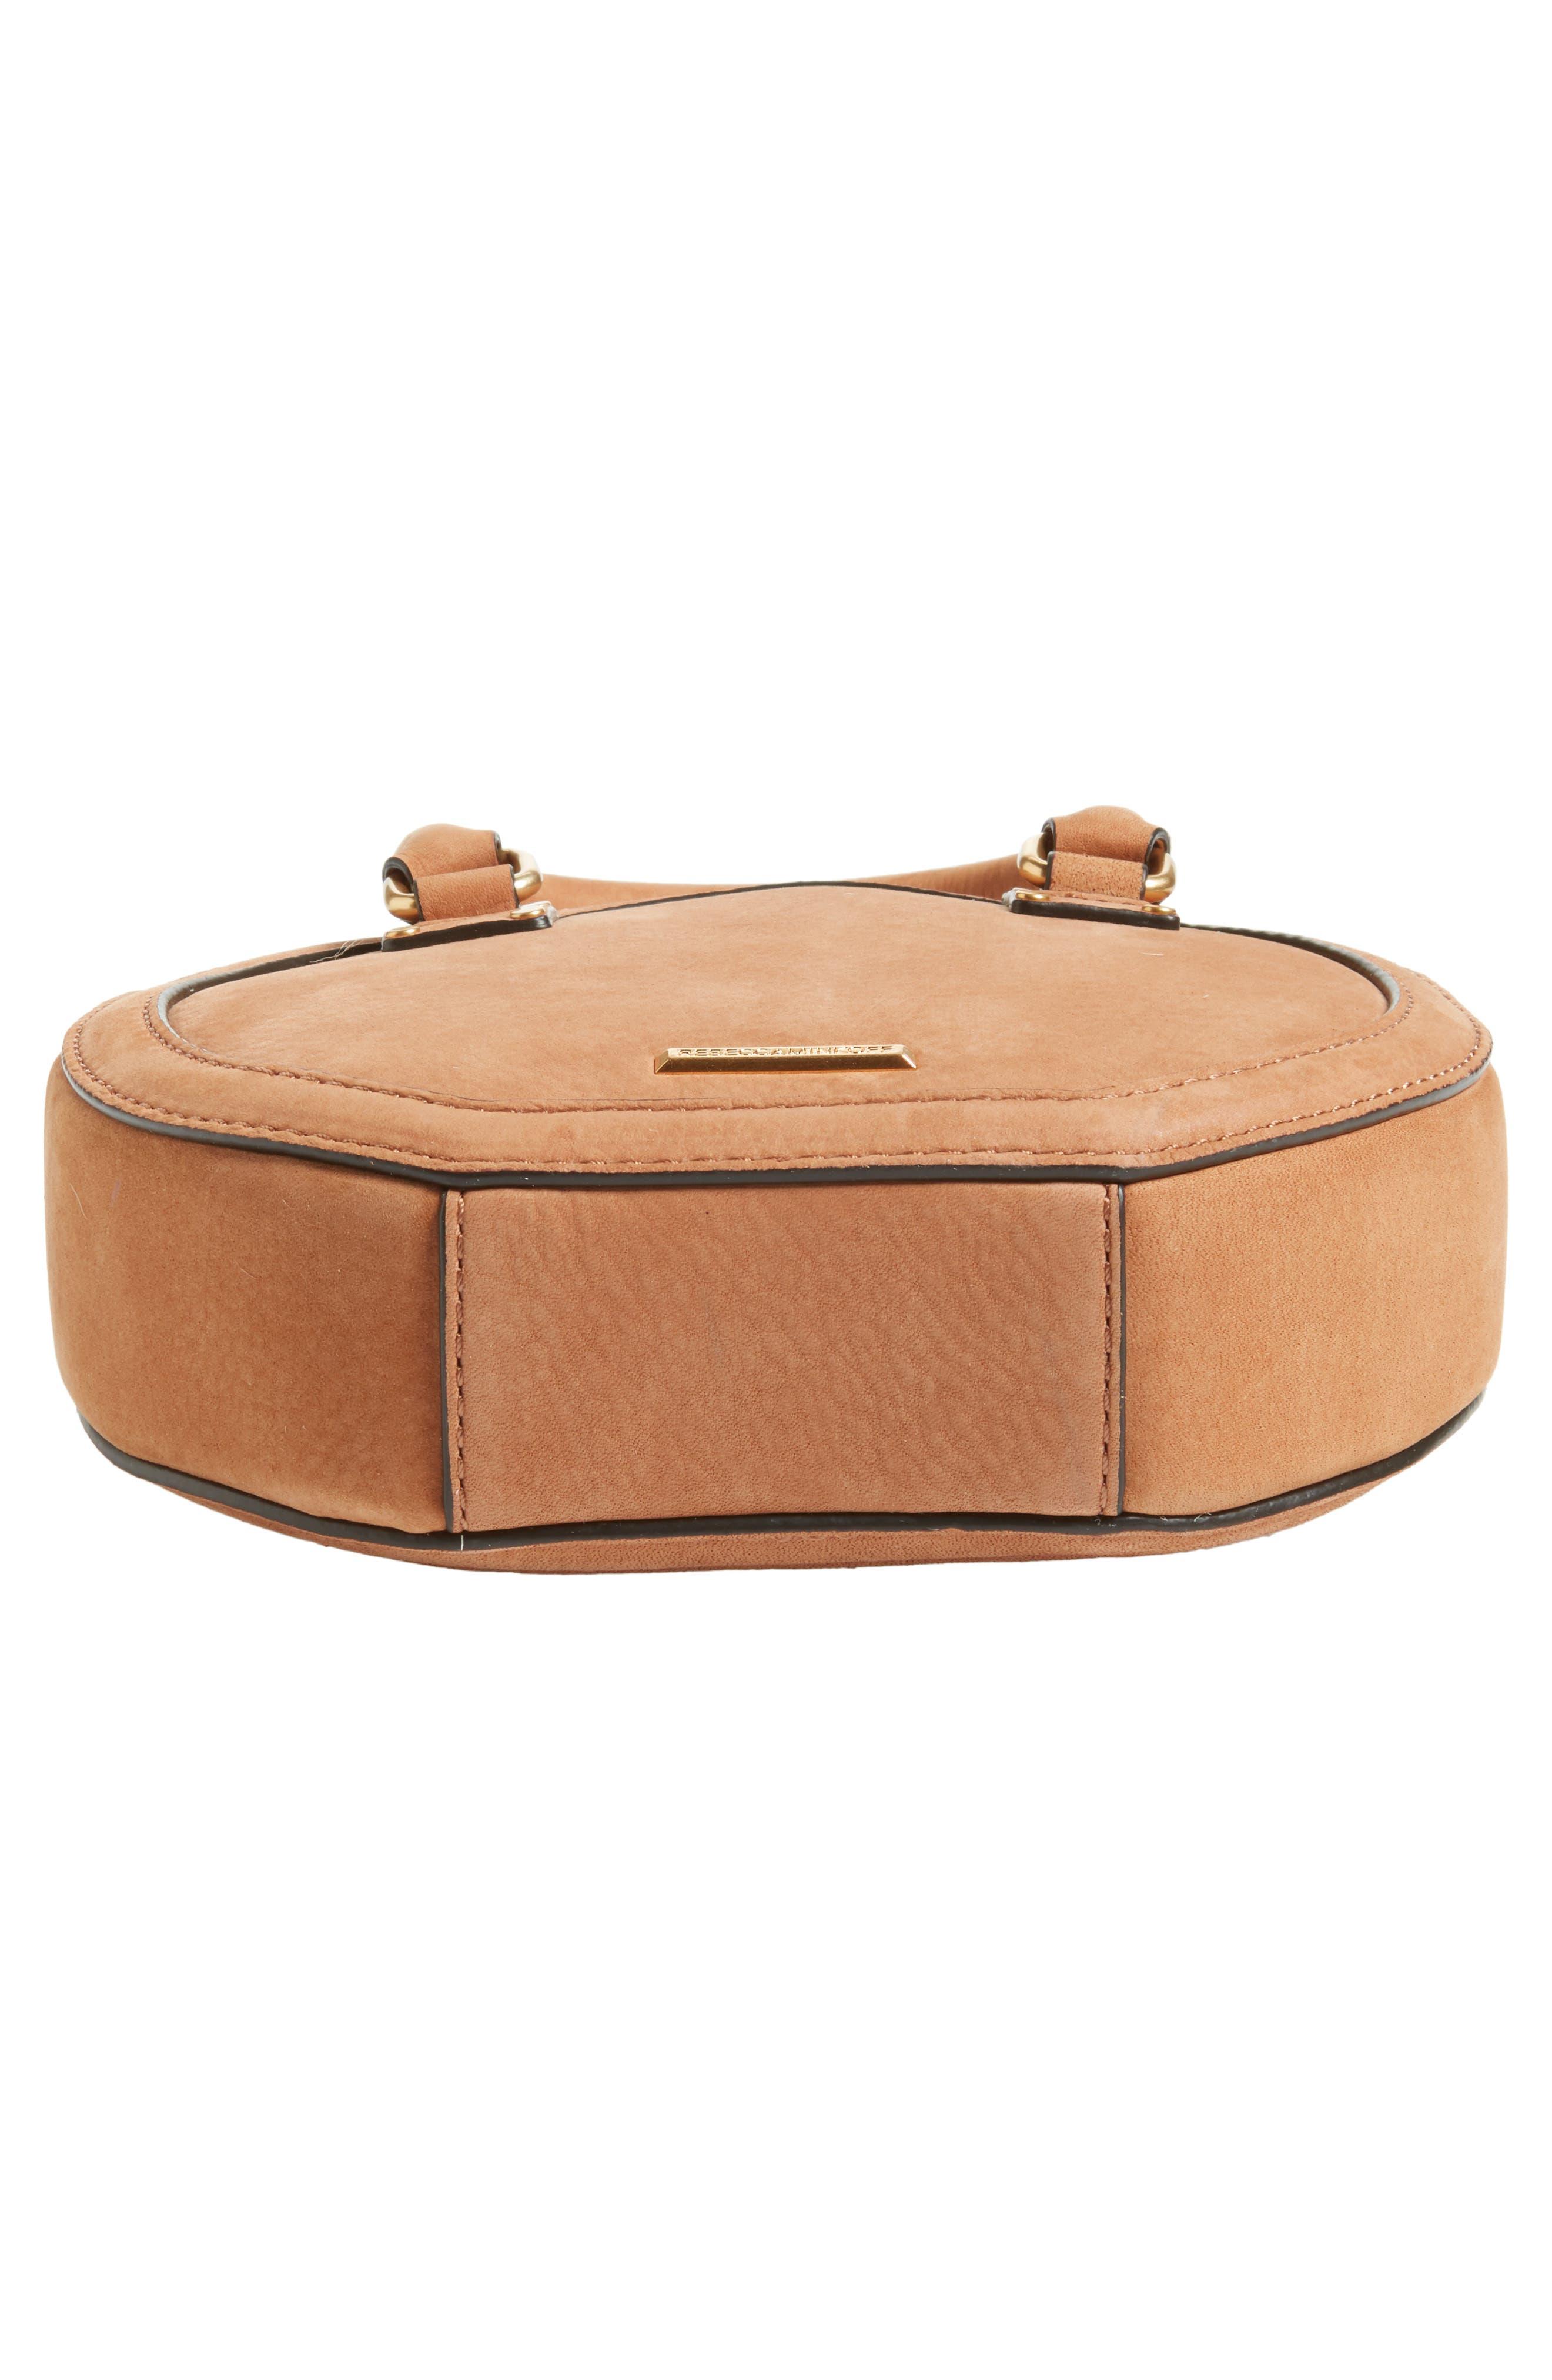 Bree Circle Crossbody Bag,                             Alternate thumbnail 6, color,                             Almond